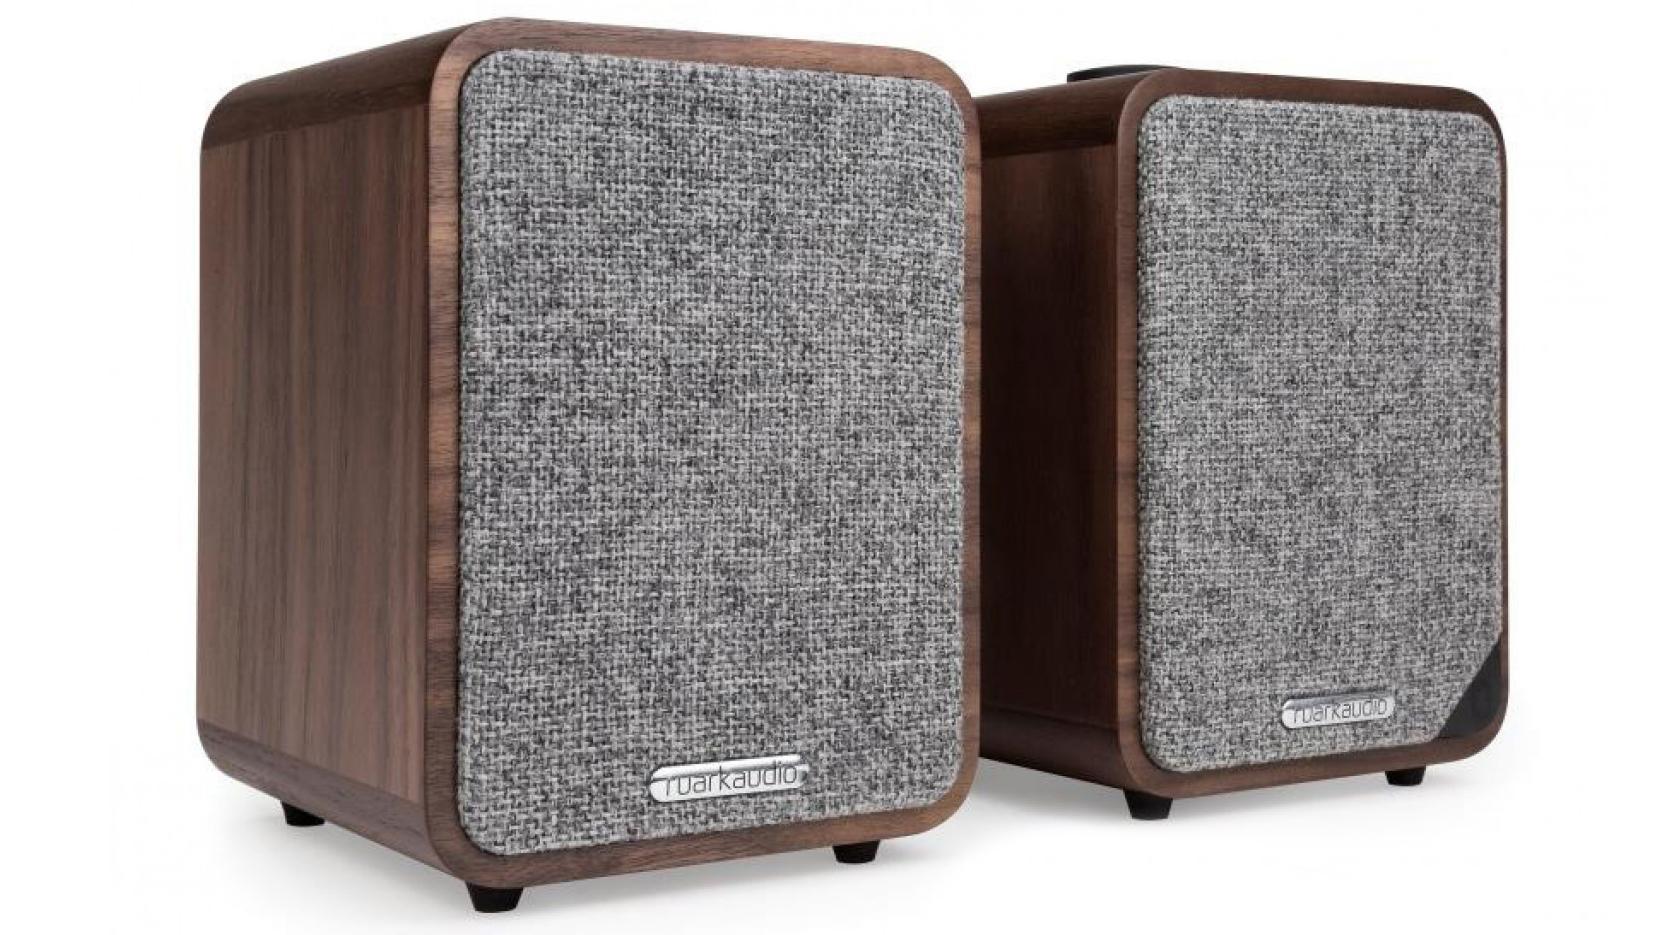 Ruark Audio MR1 MK2 wireless speakers